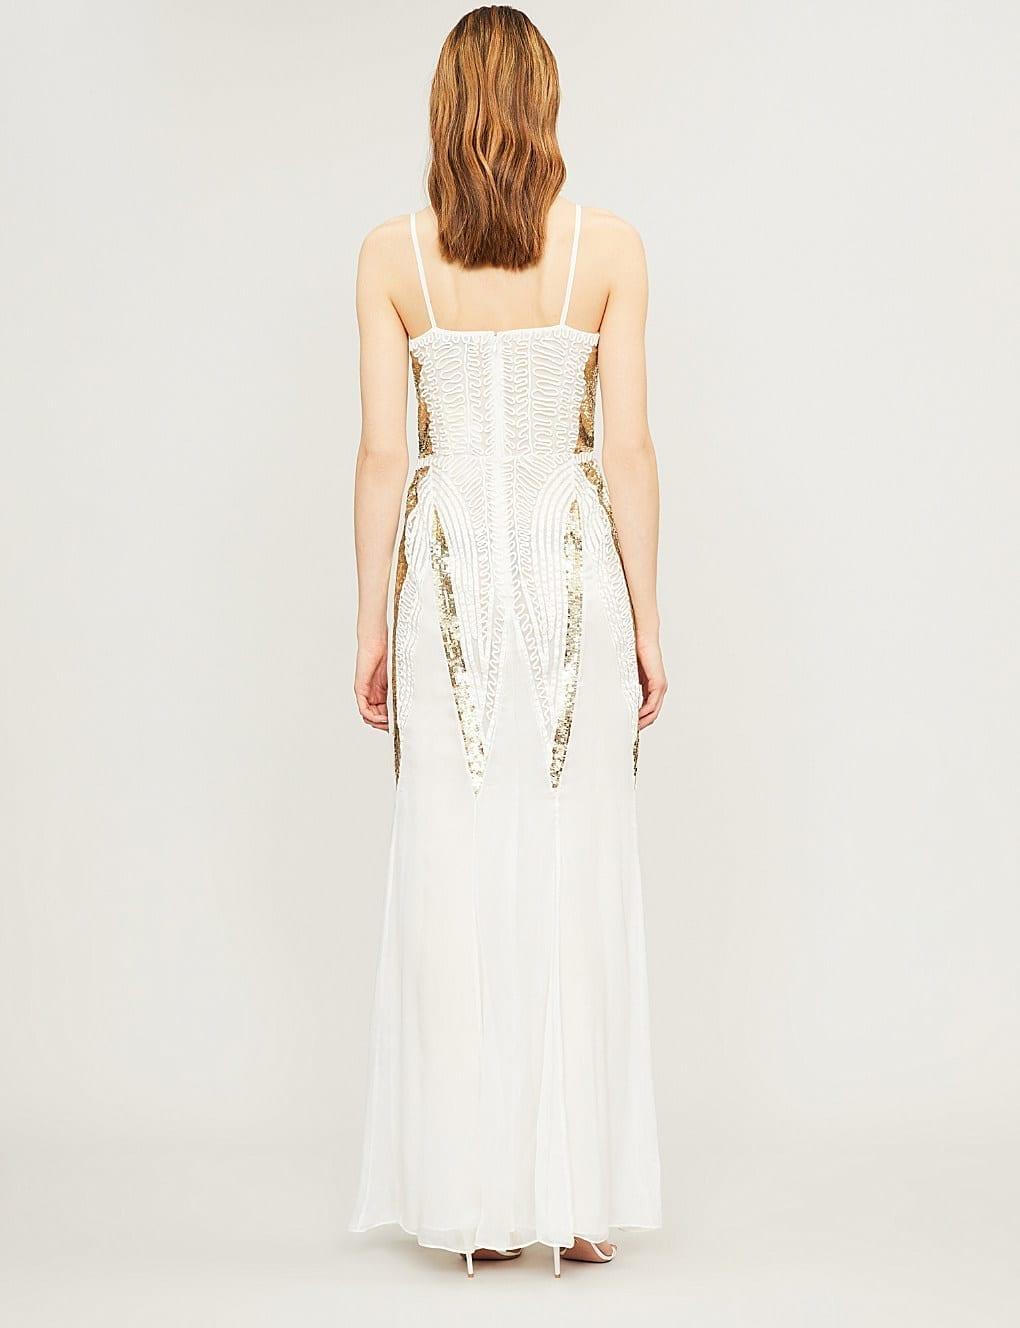 TEMPERLEY LONDON Moondrop Sequinned White Dress